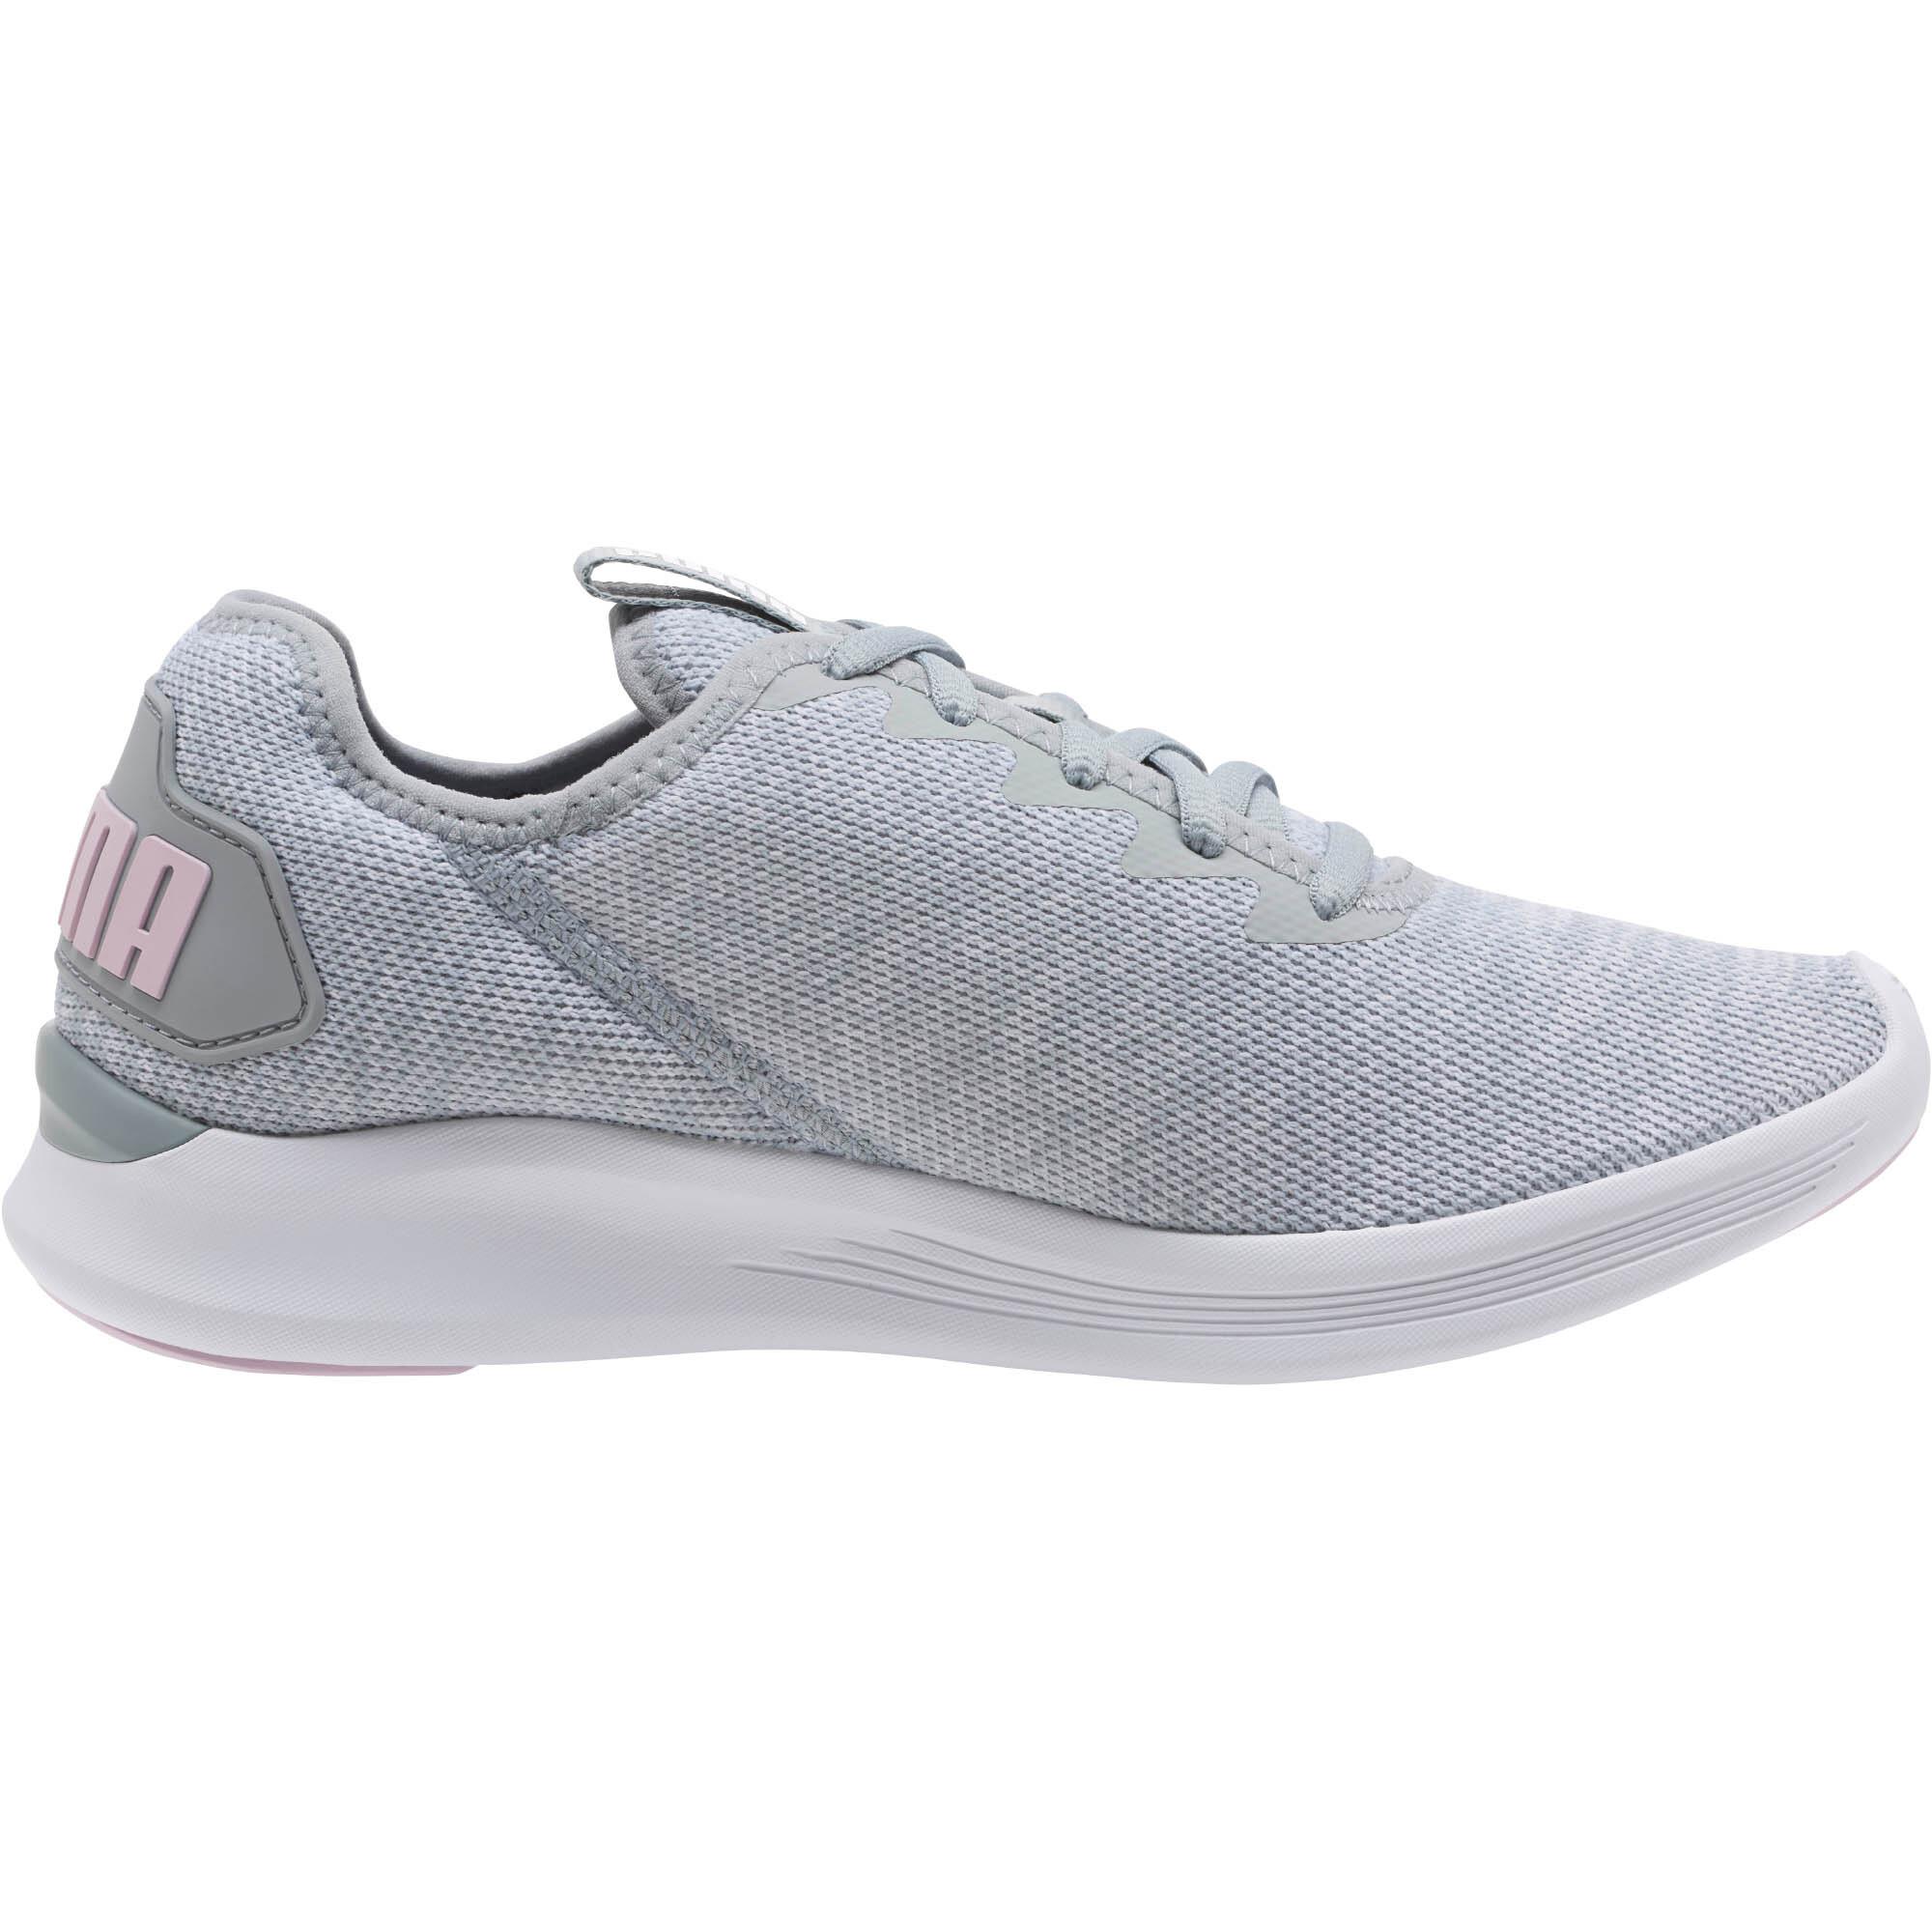 PUMA-Ballast-Women-039-s-Running-Shoes-Women-Shoe-Running thumbnail 20